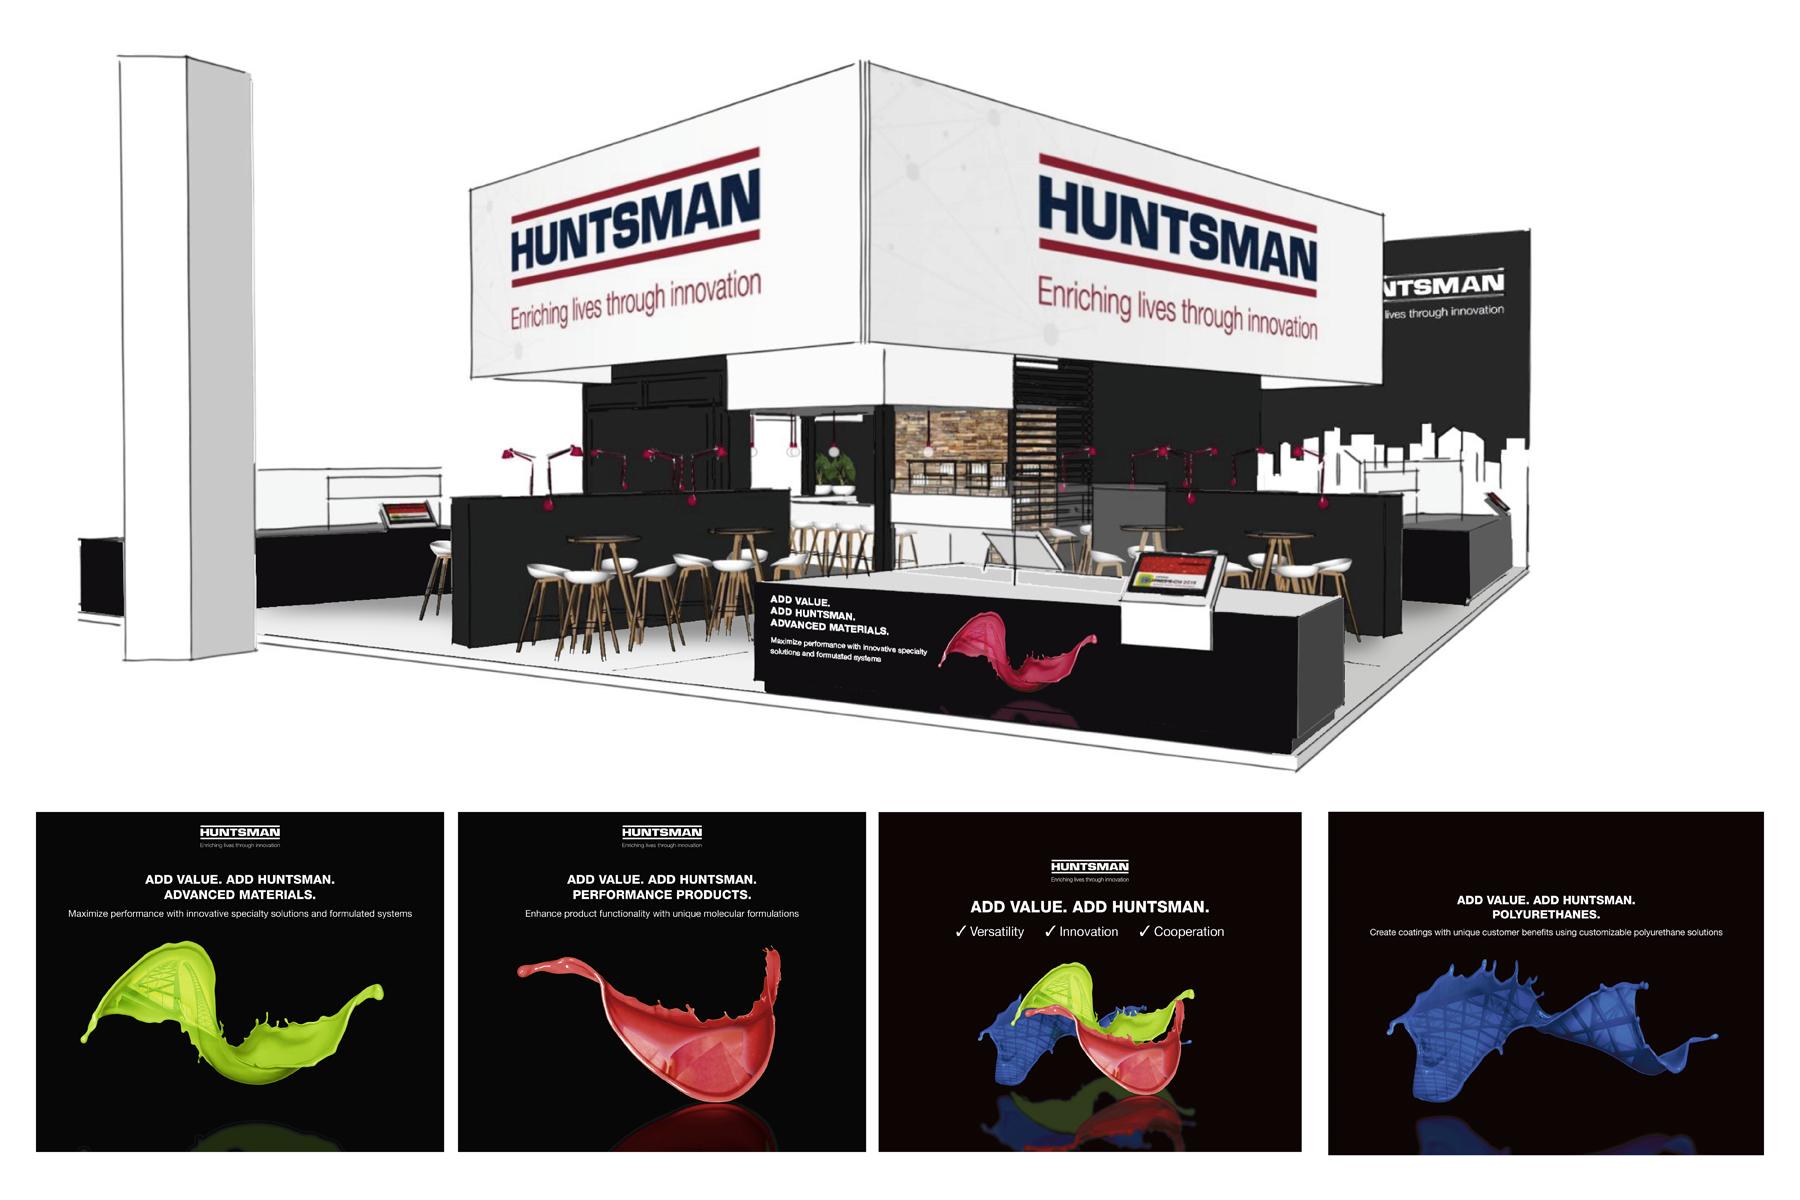 Centigrade - Huntsman European Coatings Show